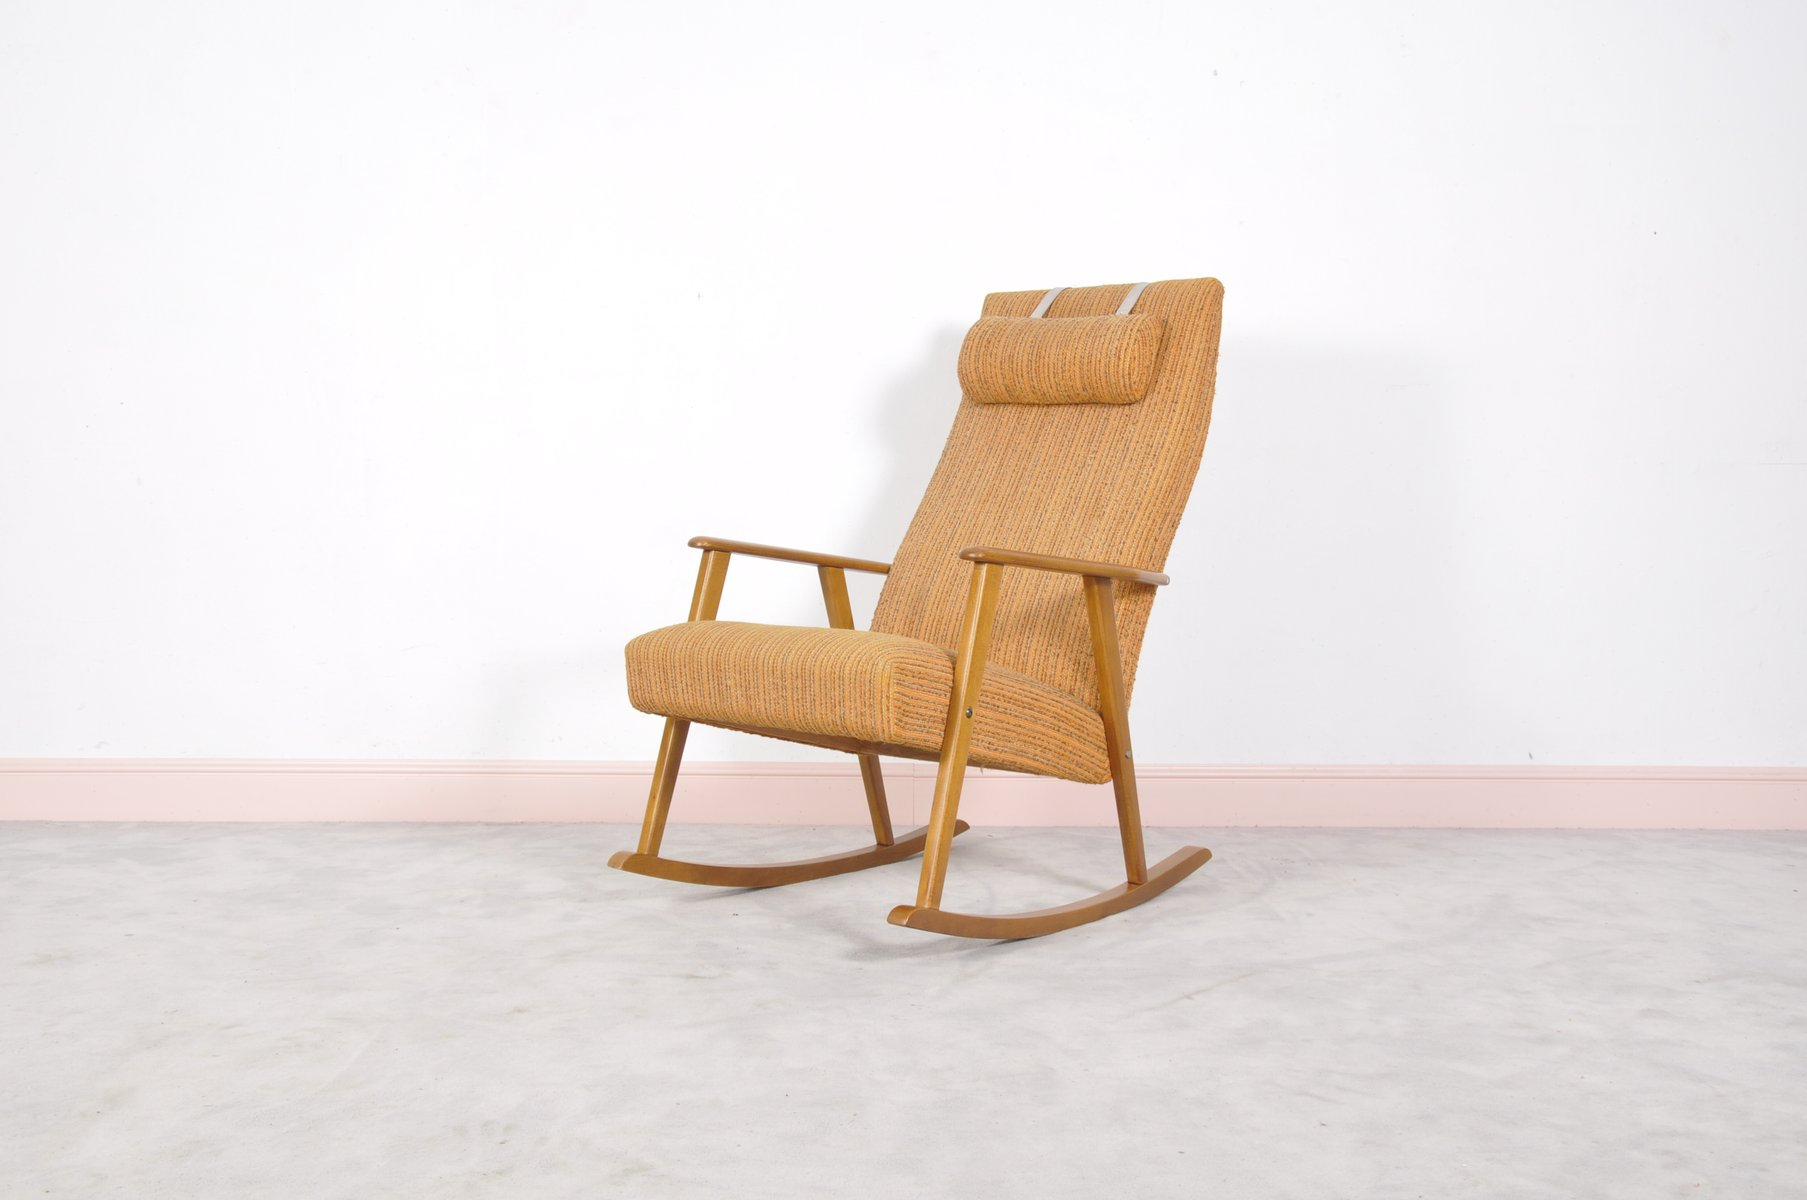 Mid Century Modern Swedish Rocking Chair by Johanson 1960s for